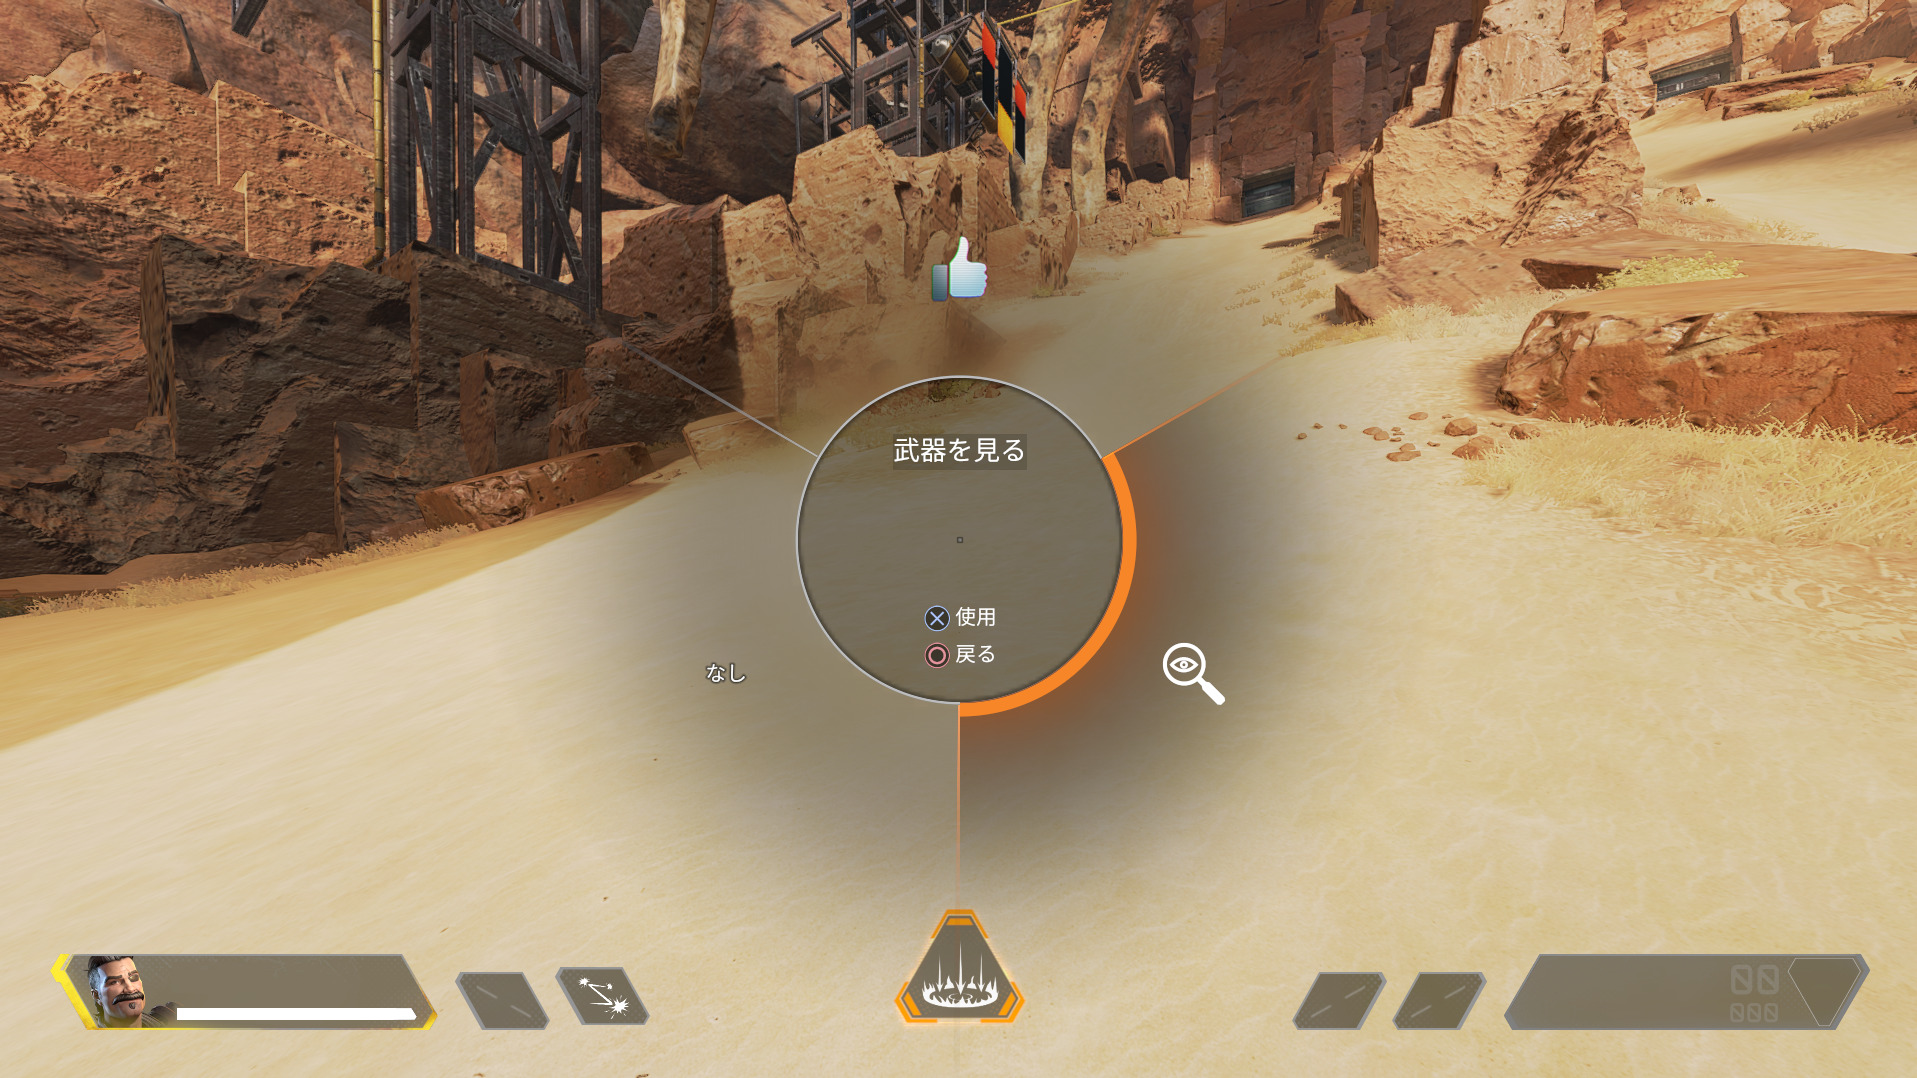 【Apex Legends】走りながら武器を見る、エモート、モーションをする設定方法【エーペックスレジェンズ】